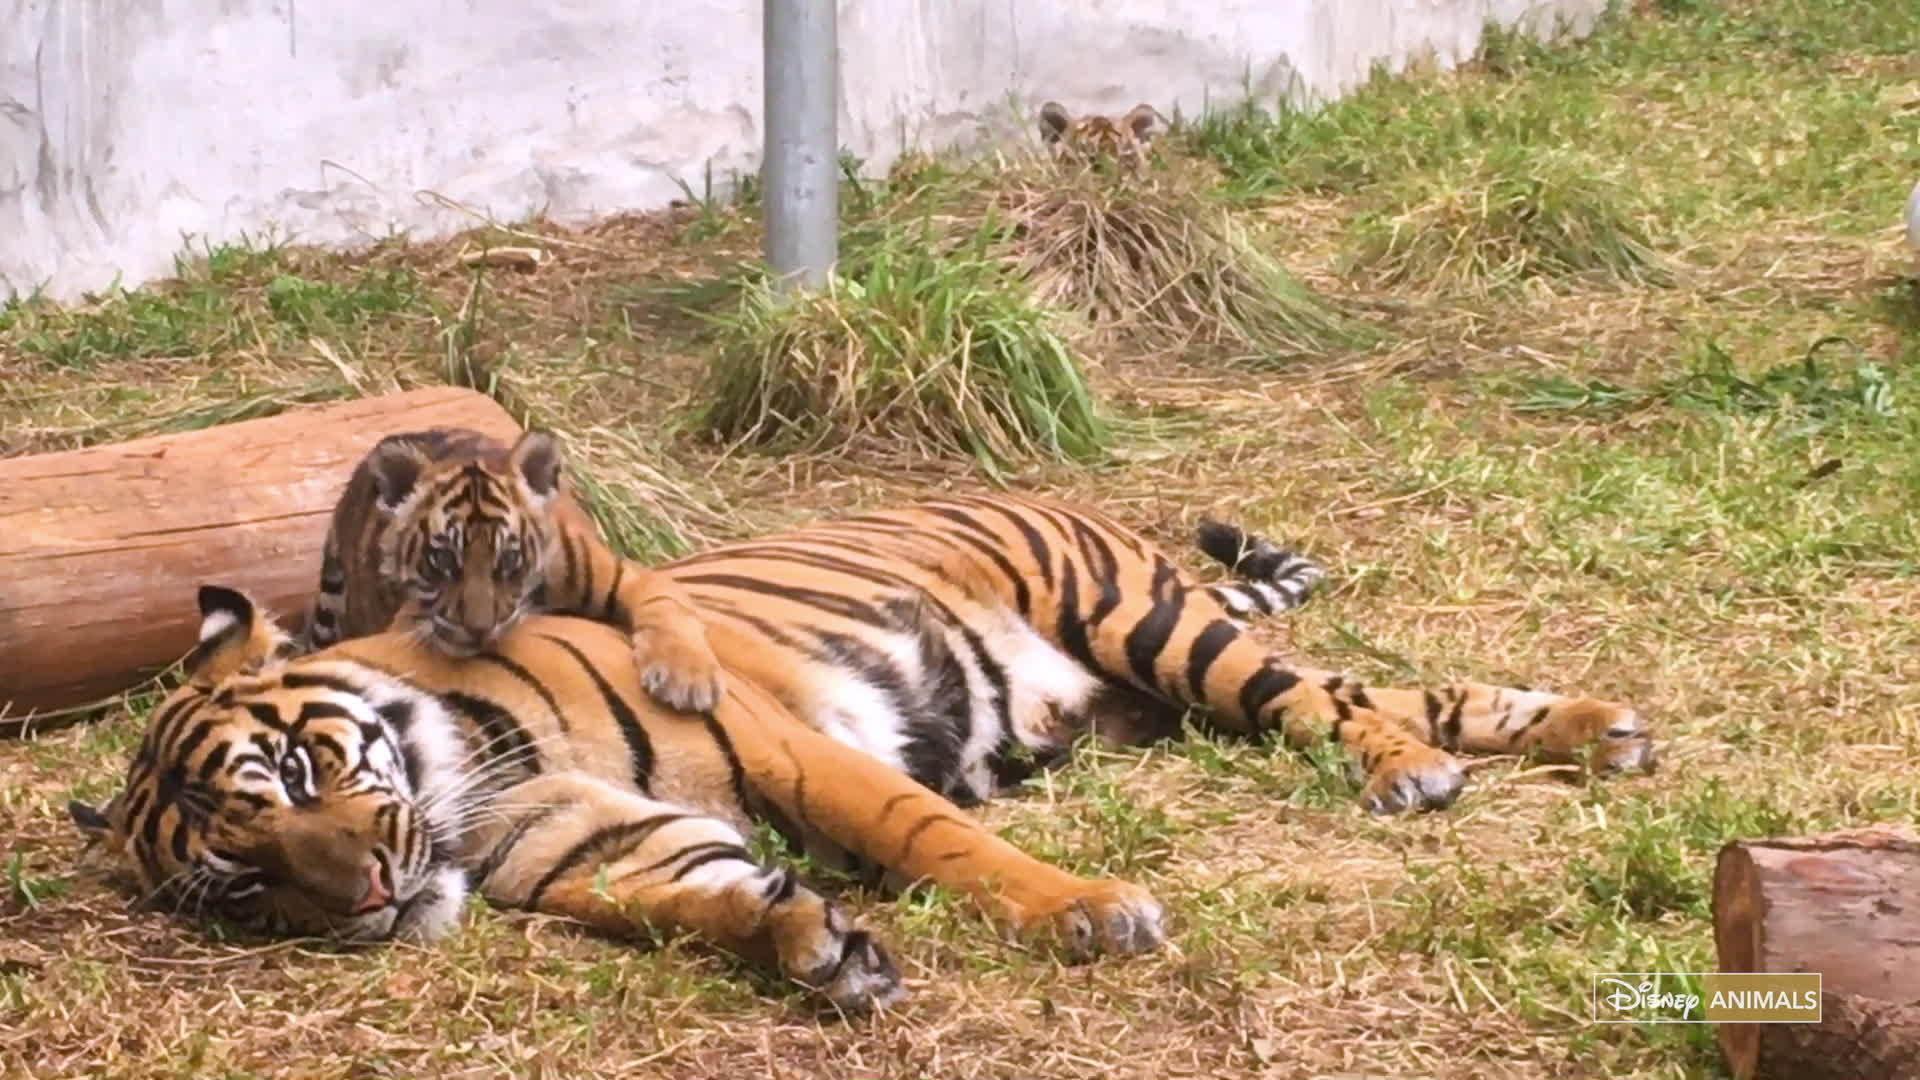 Tiger cub reahing up clipart clip art library stock Tiger Cubs clip art library stock